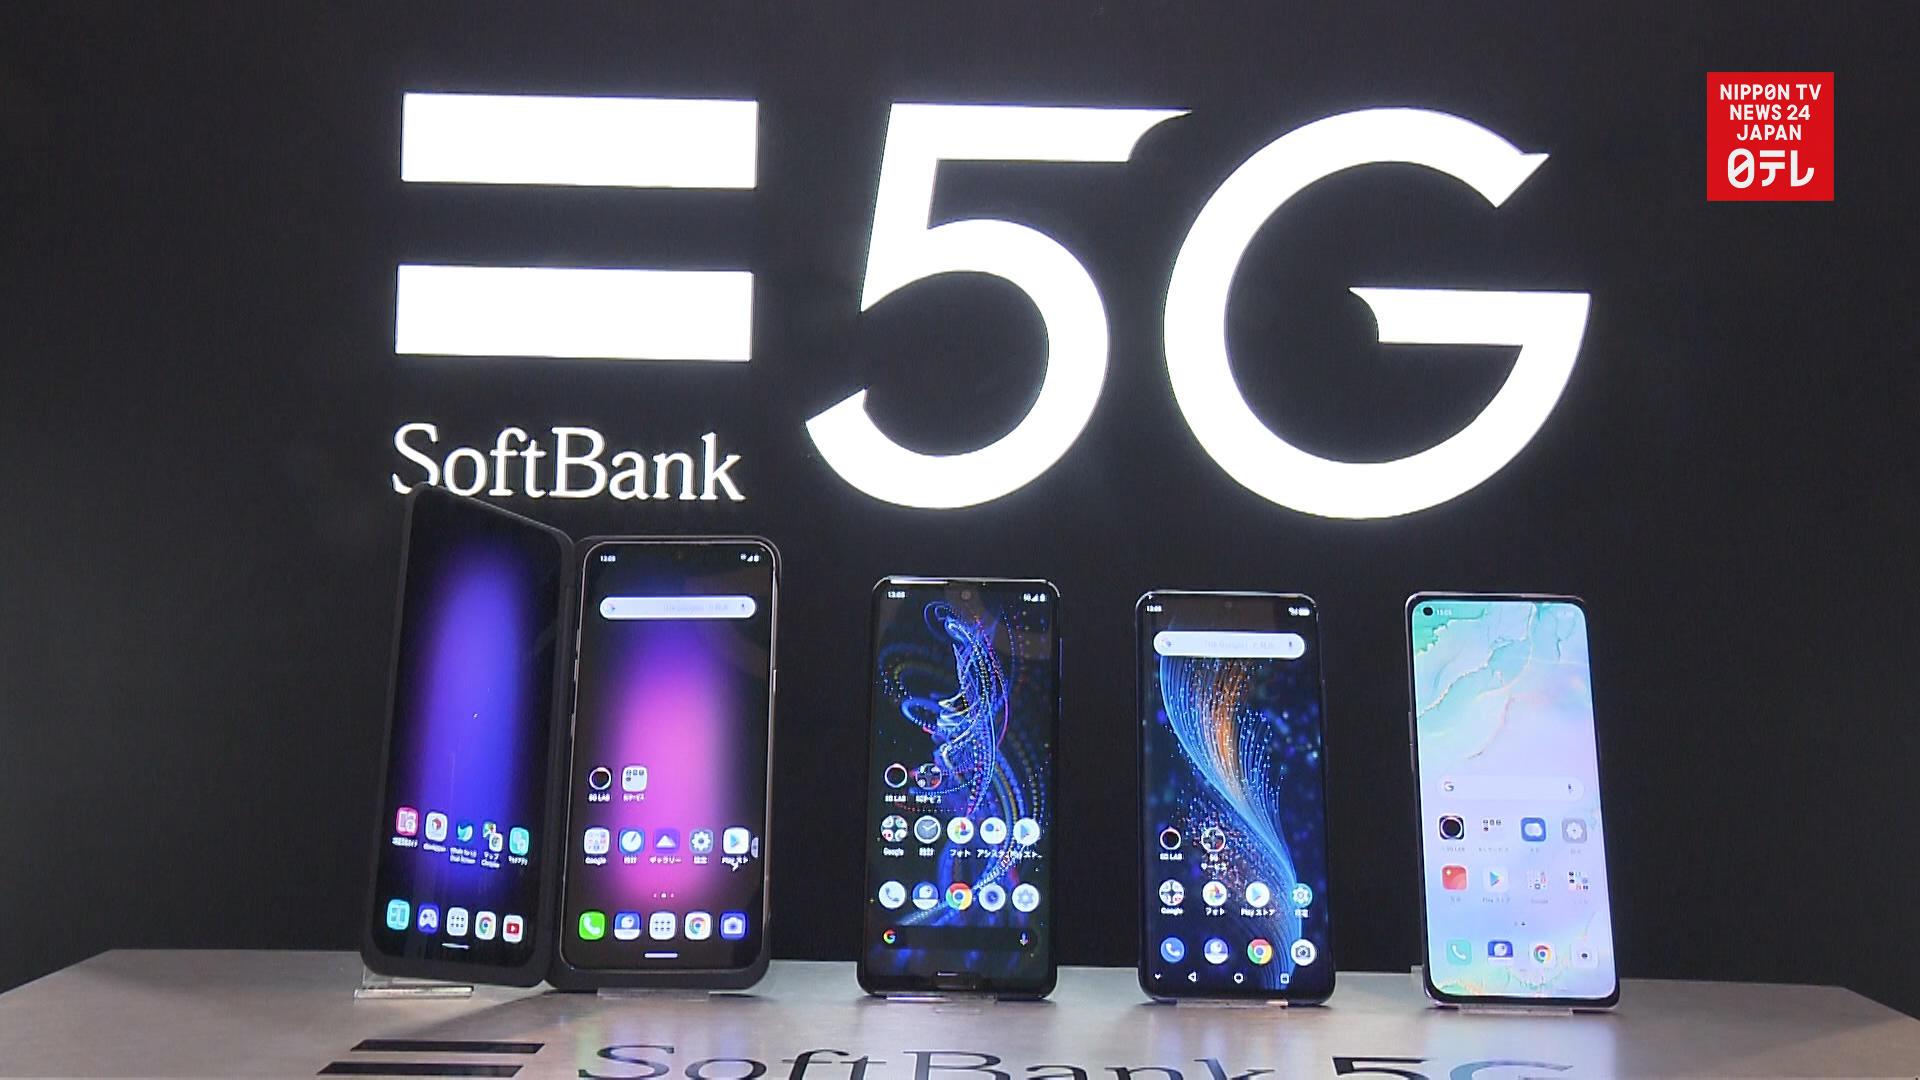 Japan has 5G cellphone service